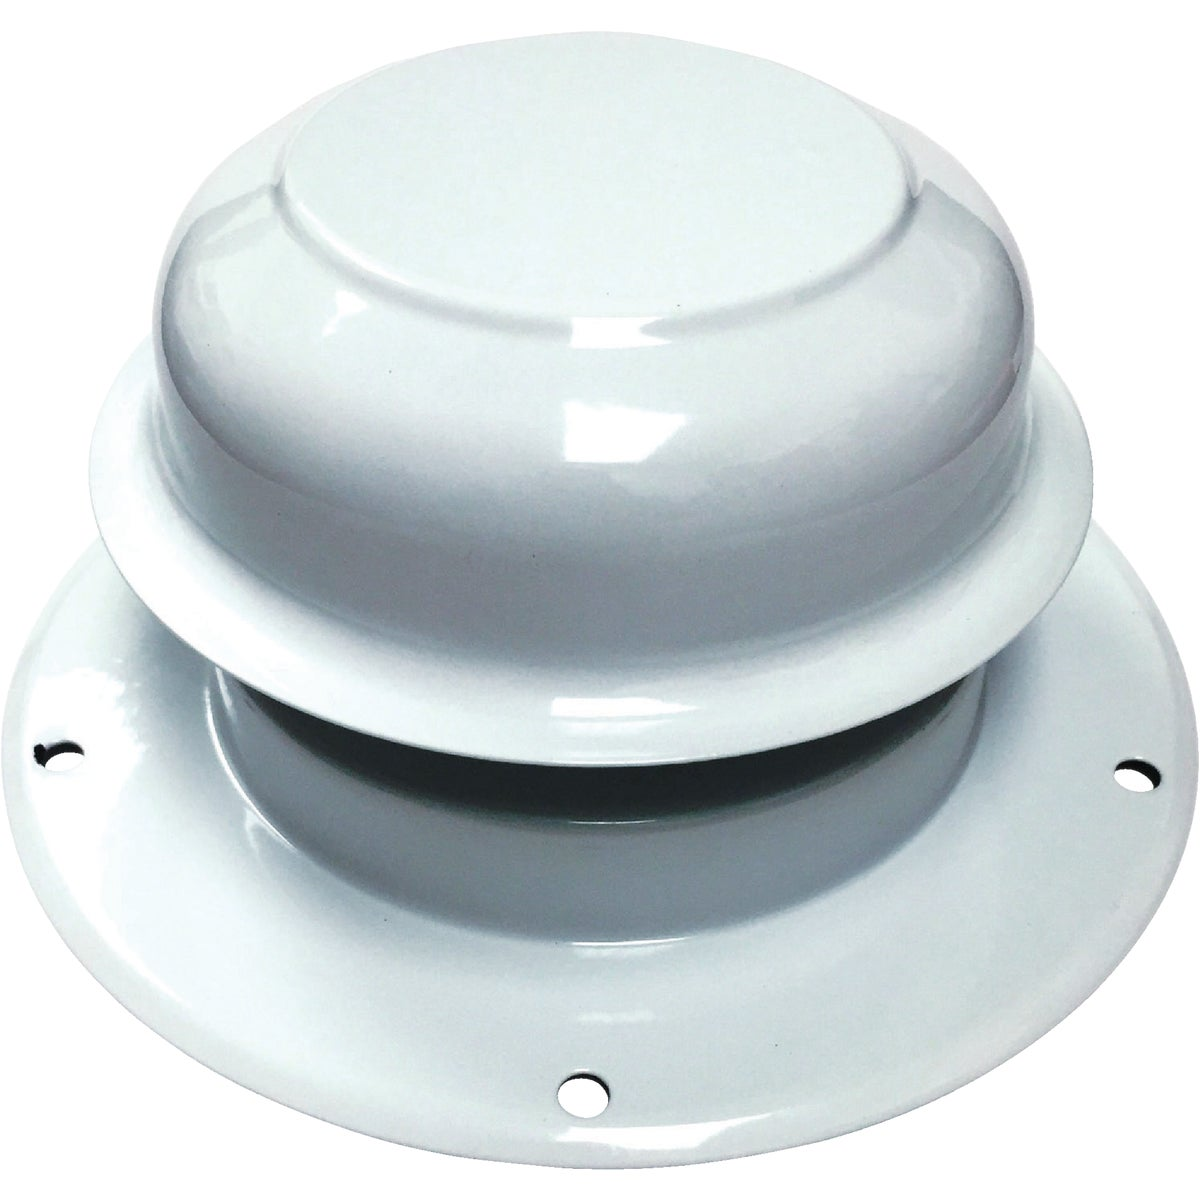 "2"" GALV PLUMBING CAP - V-015C by U S Hardware"